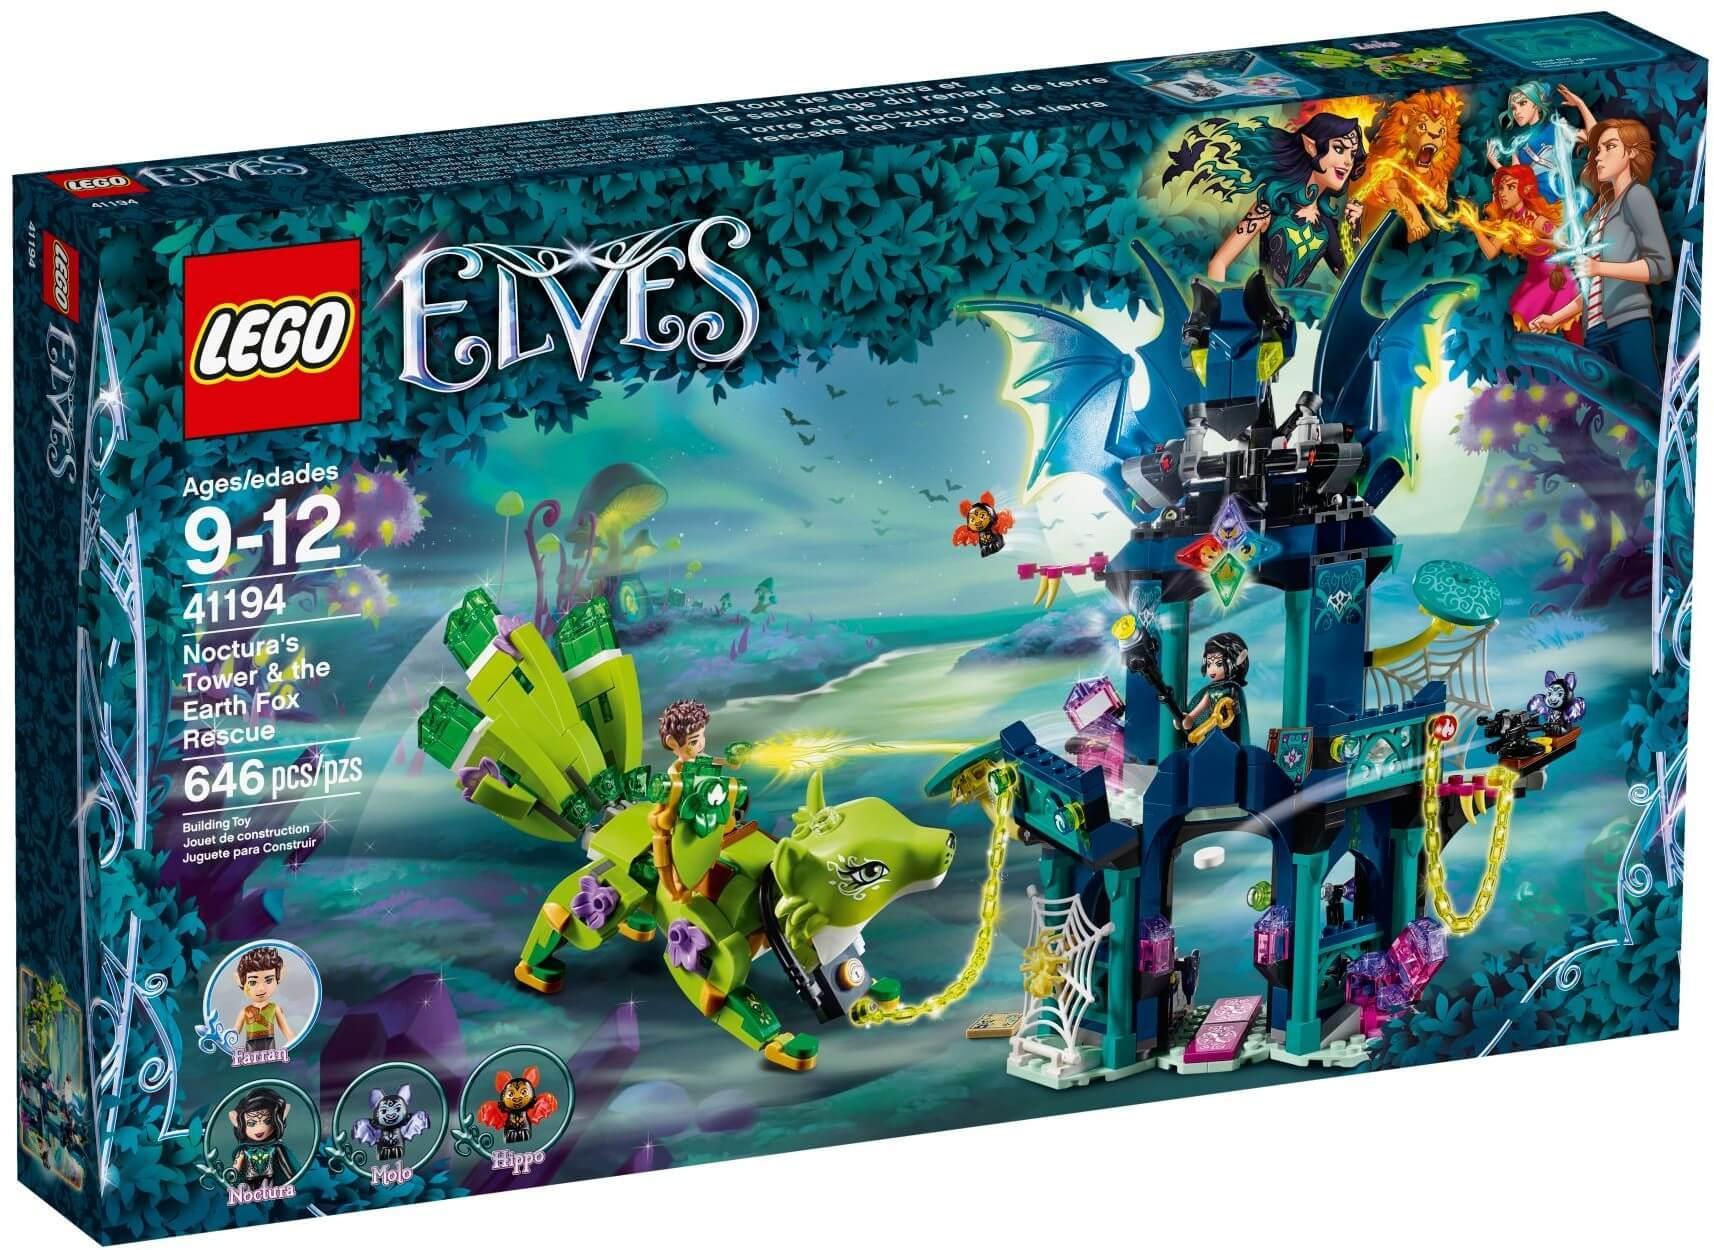 Mua đồ chơi LEGO 41194 - LEGO Elves 41194 - Tòa Tháp Ma Thuật của Noctura (LEGO Elves 41194 Noctura's Tower & the Earth Fox Rescue)